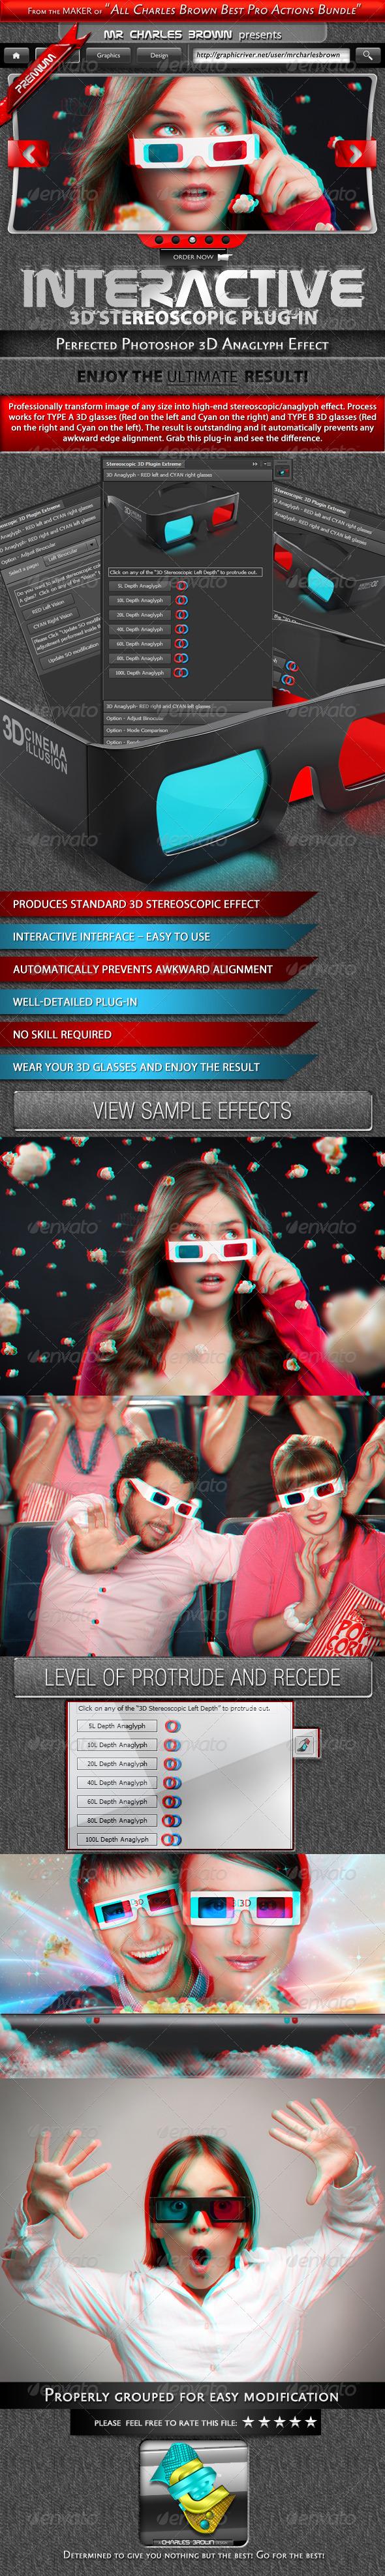 GraphicRiver Interactive 3D Stereoscopic Effect 3266752